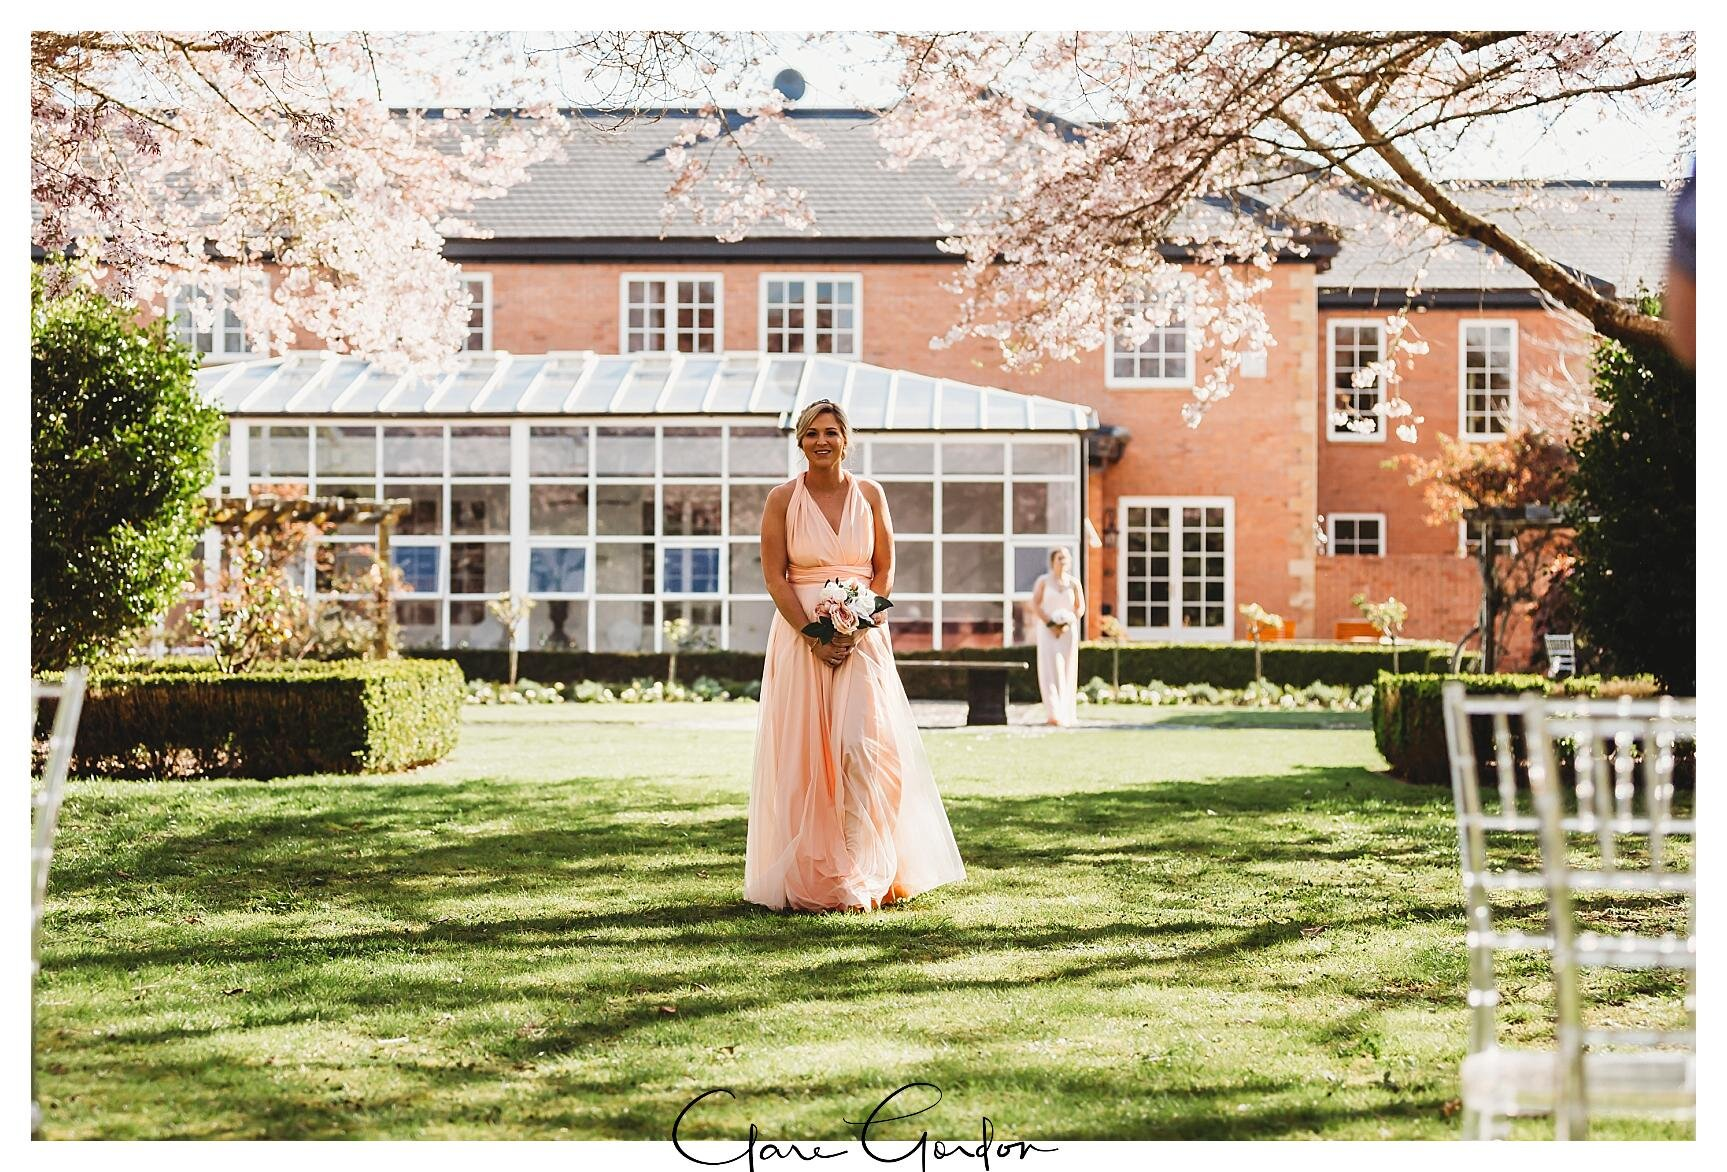 Henley-Hotel-Cherry-blossom-wedding-photos (41).jpg